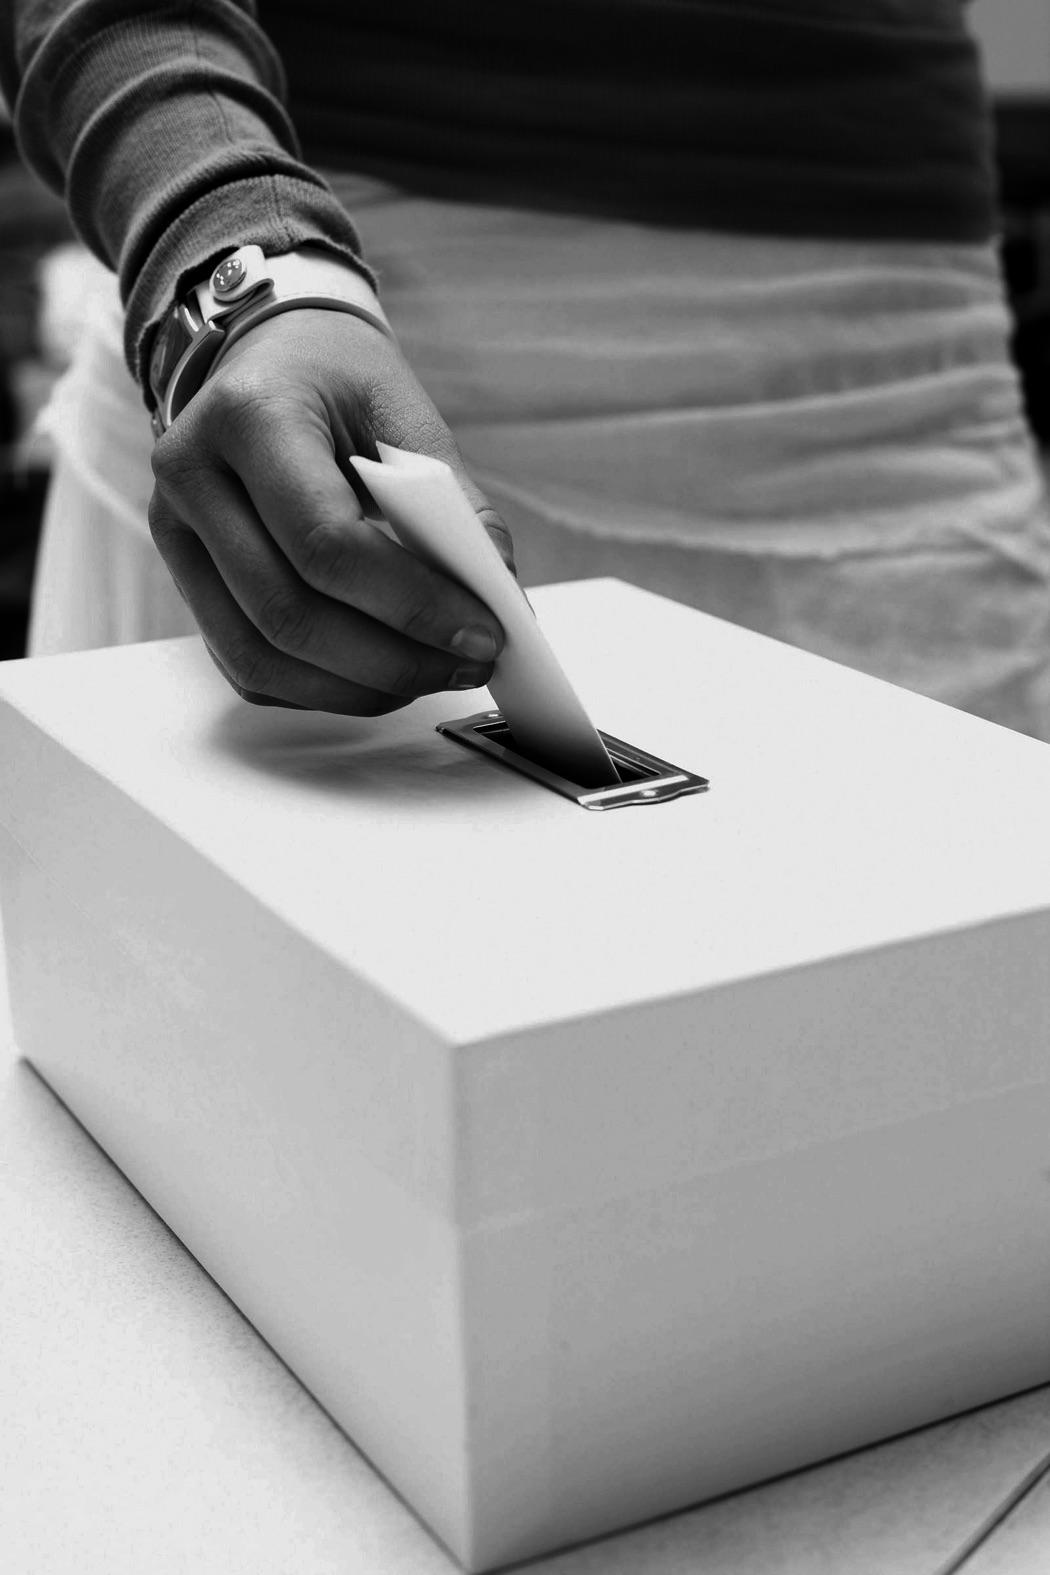 vote kuzz